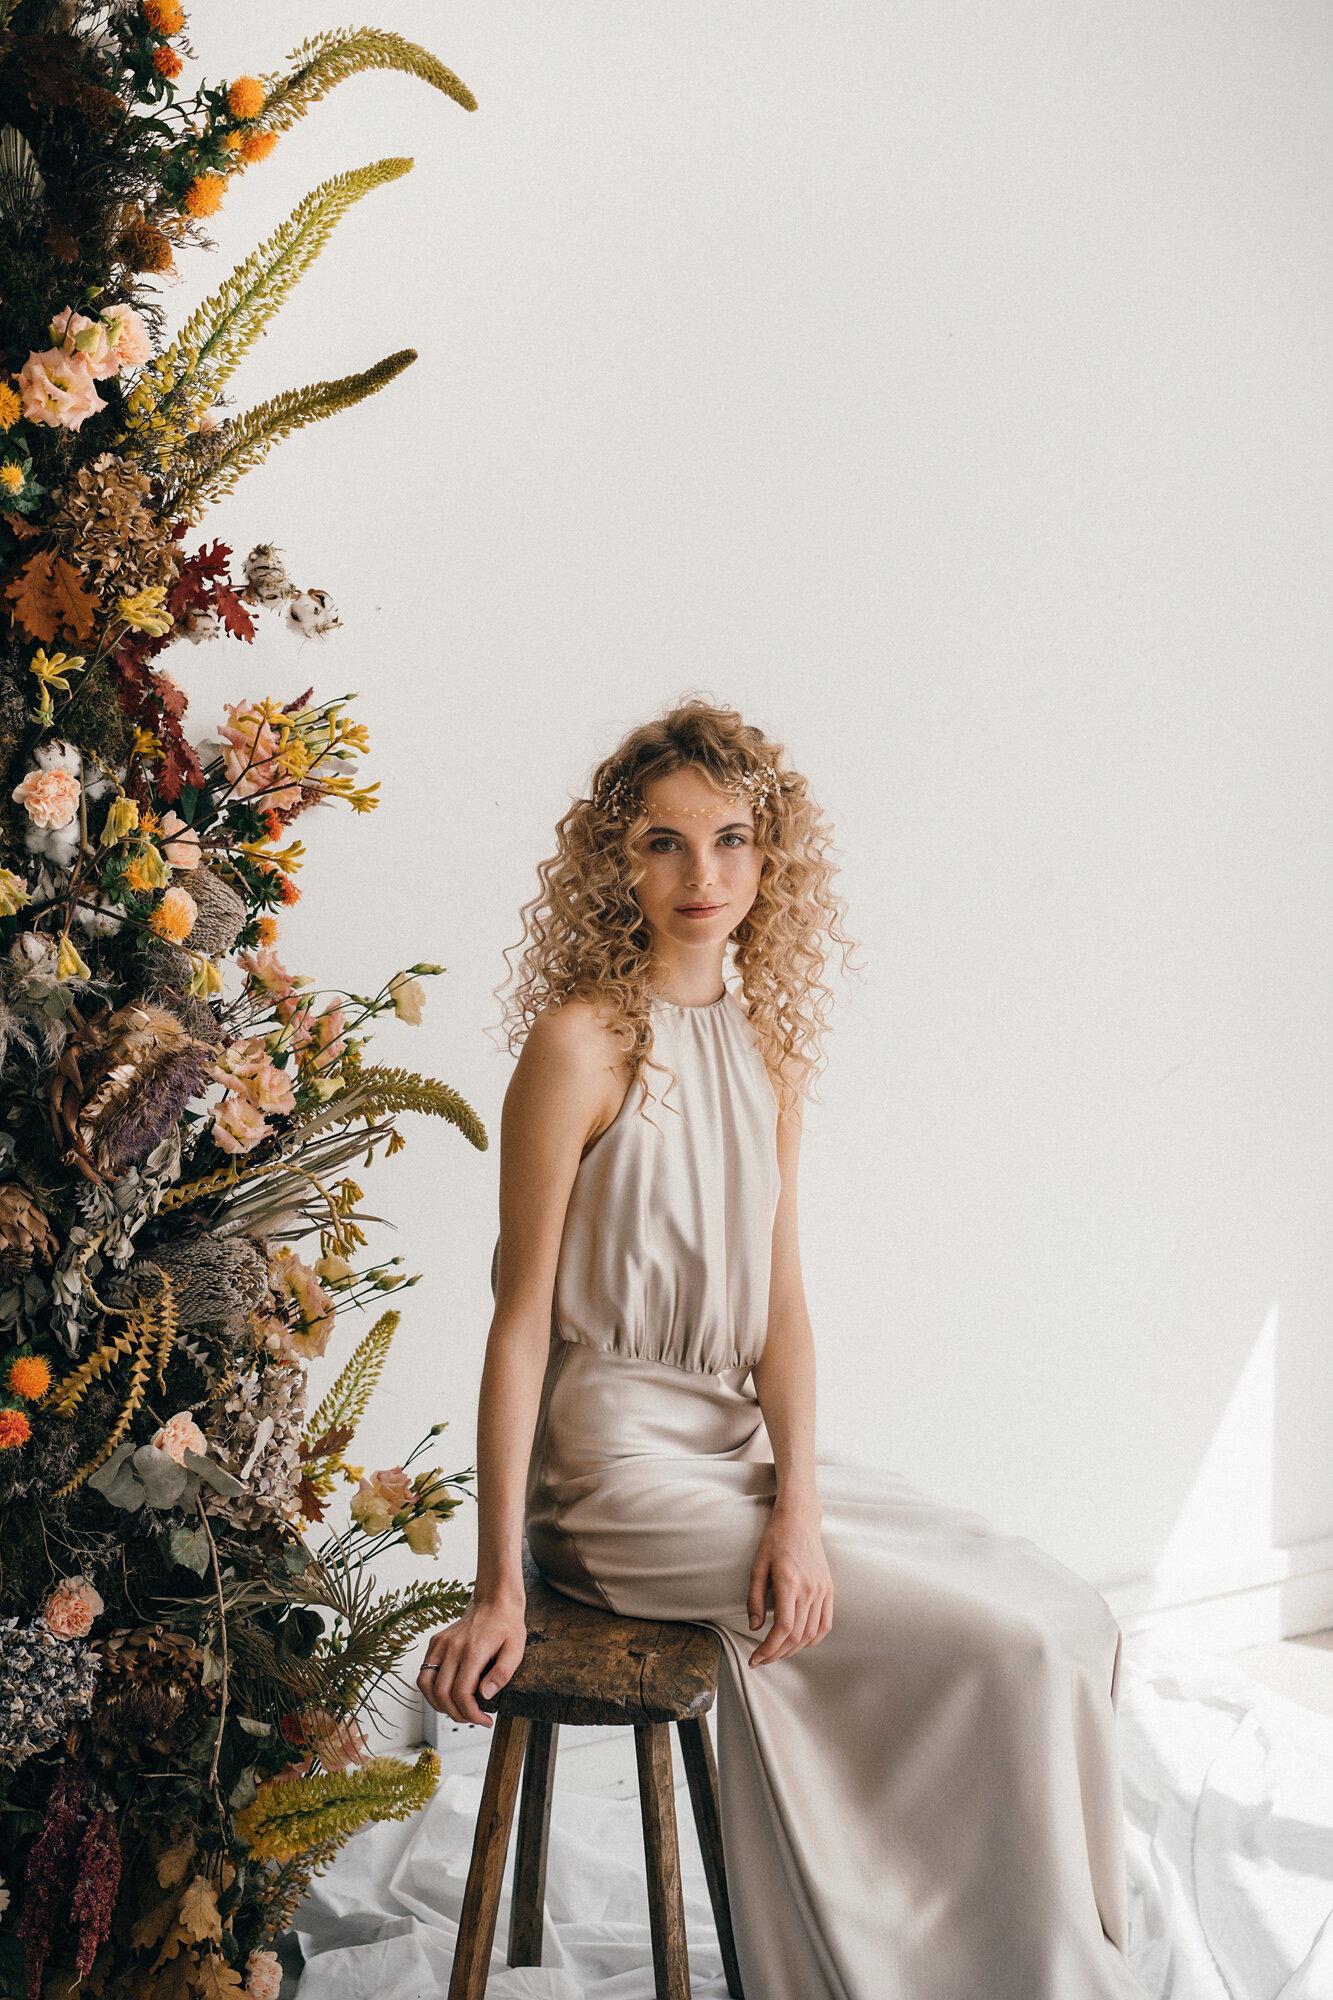 Debbie-Carlisle-Bridal-Accessories-Kate-Beaumont-Wedding-Gowns-Sheffield-Yorkshire-UK-7.jpg